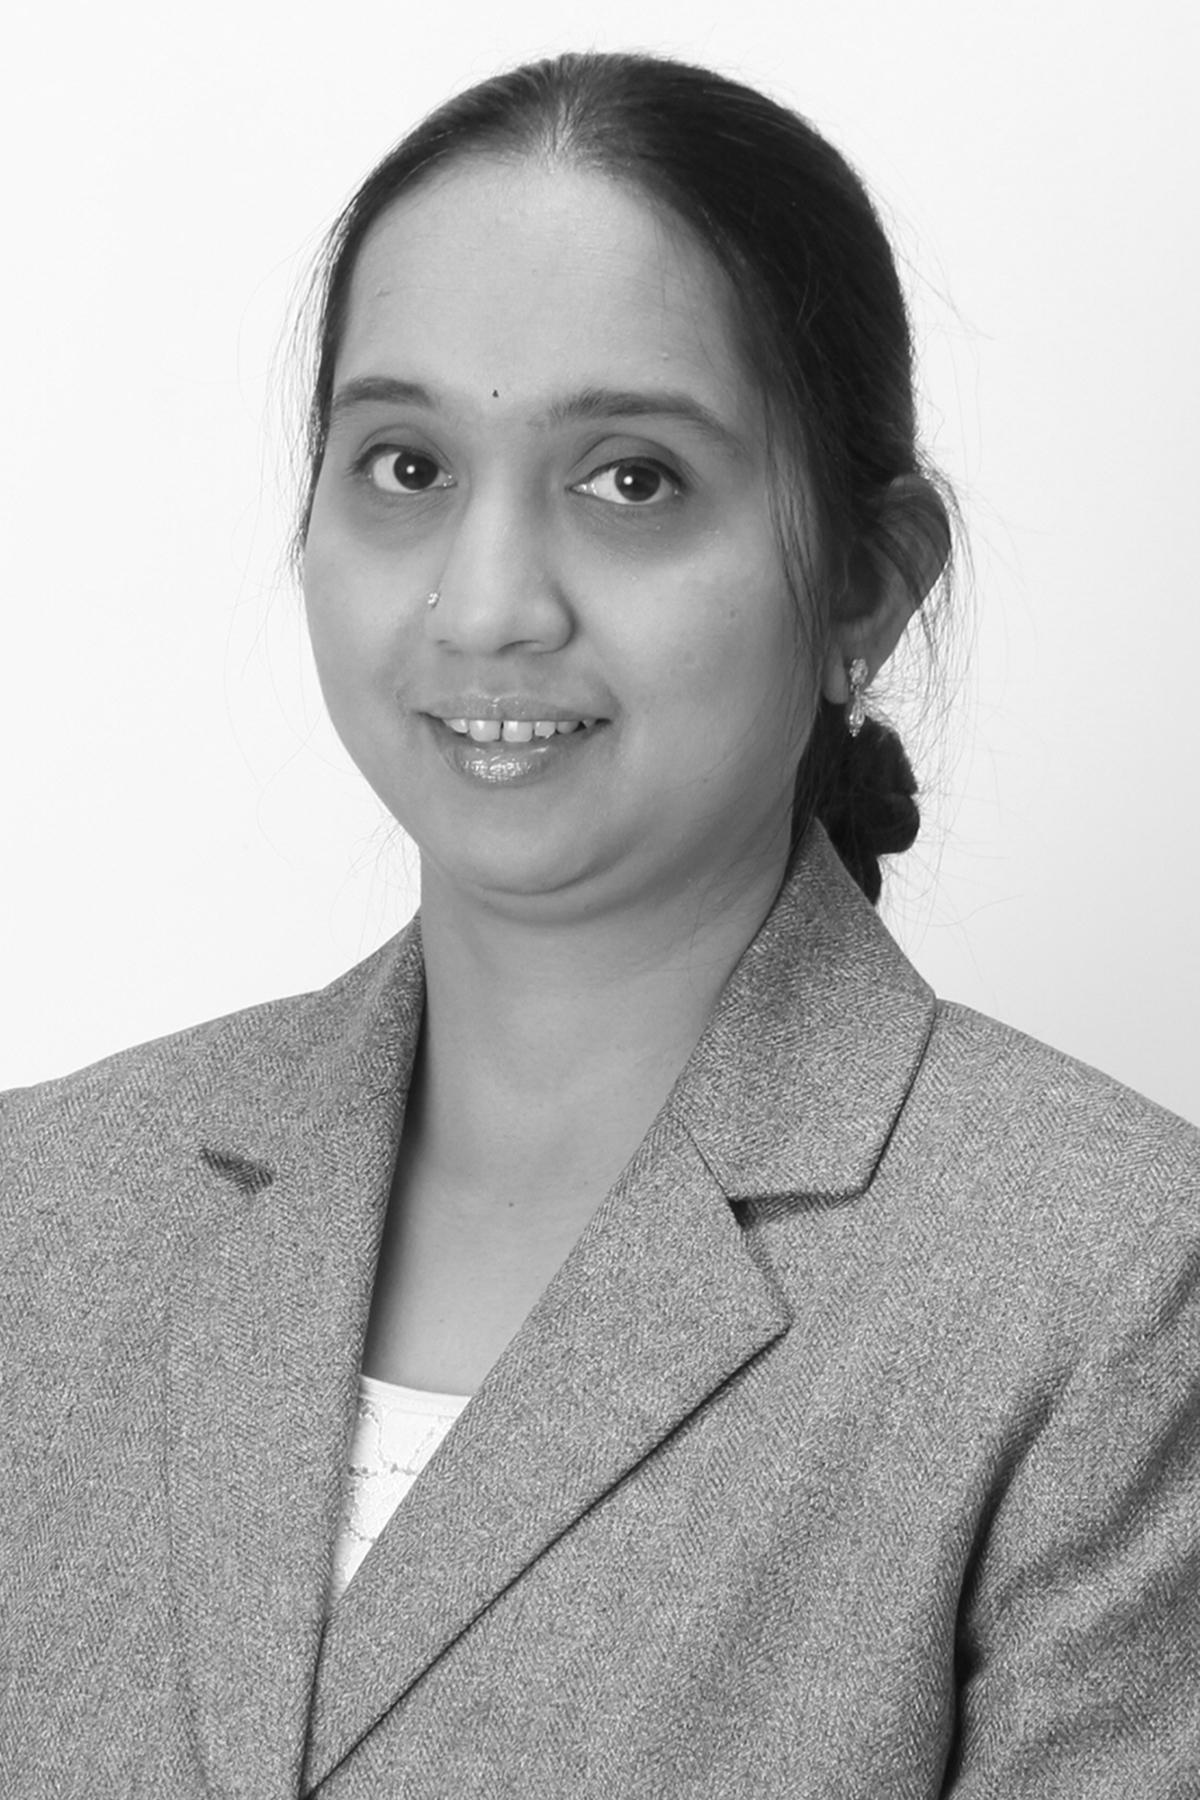 Chandhricca Rav